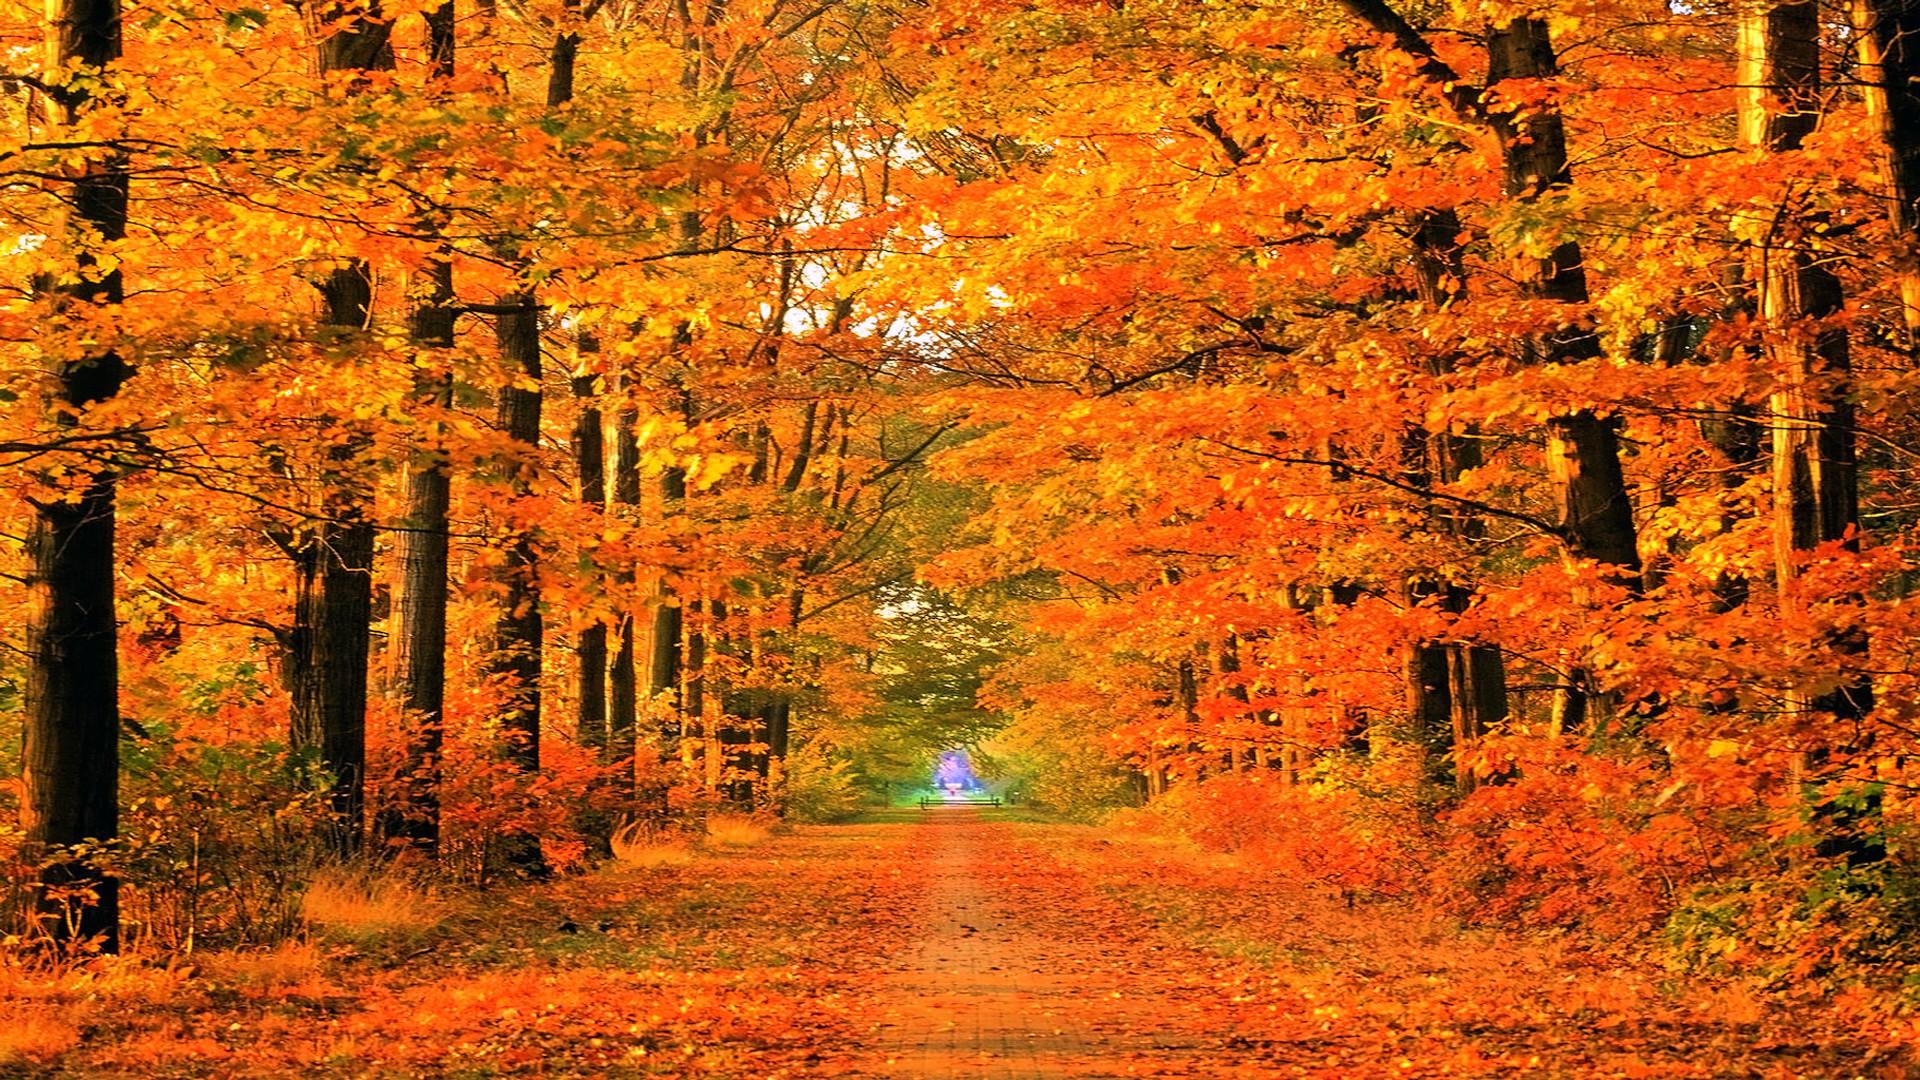 Autumn Roads Wallpaper Autumn, Roads, Parks